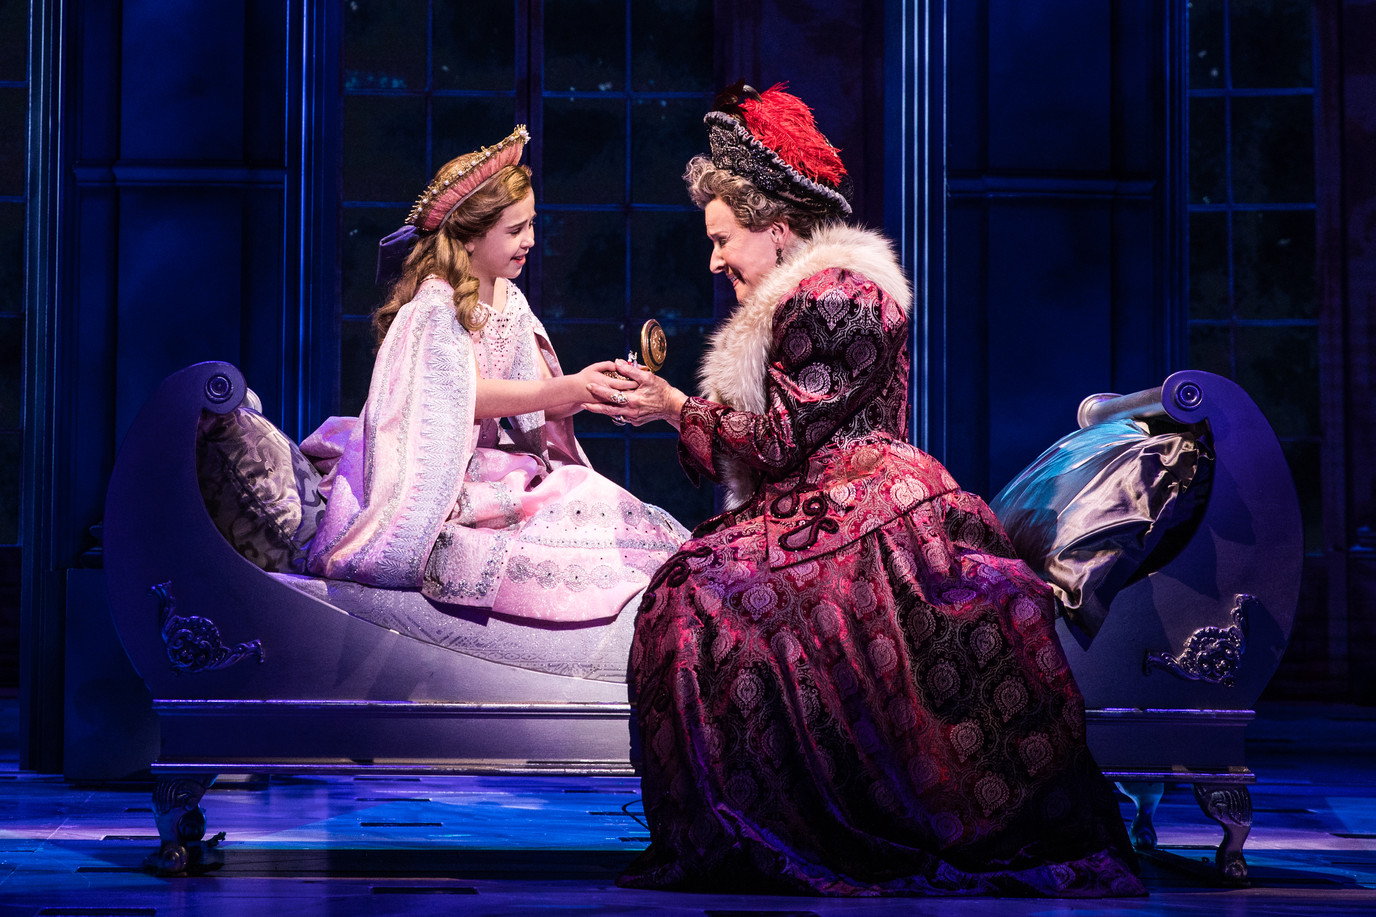 Victoria Bingham (Little Anastasia) and Joy Franz (Dowager Empress) in the National Tour of ANASTASIA.